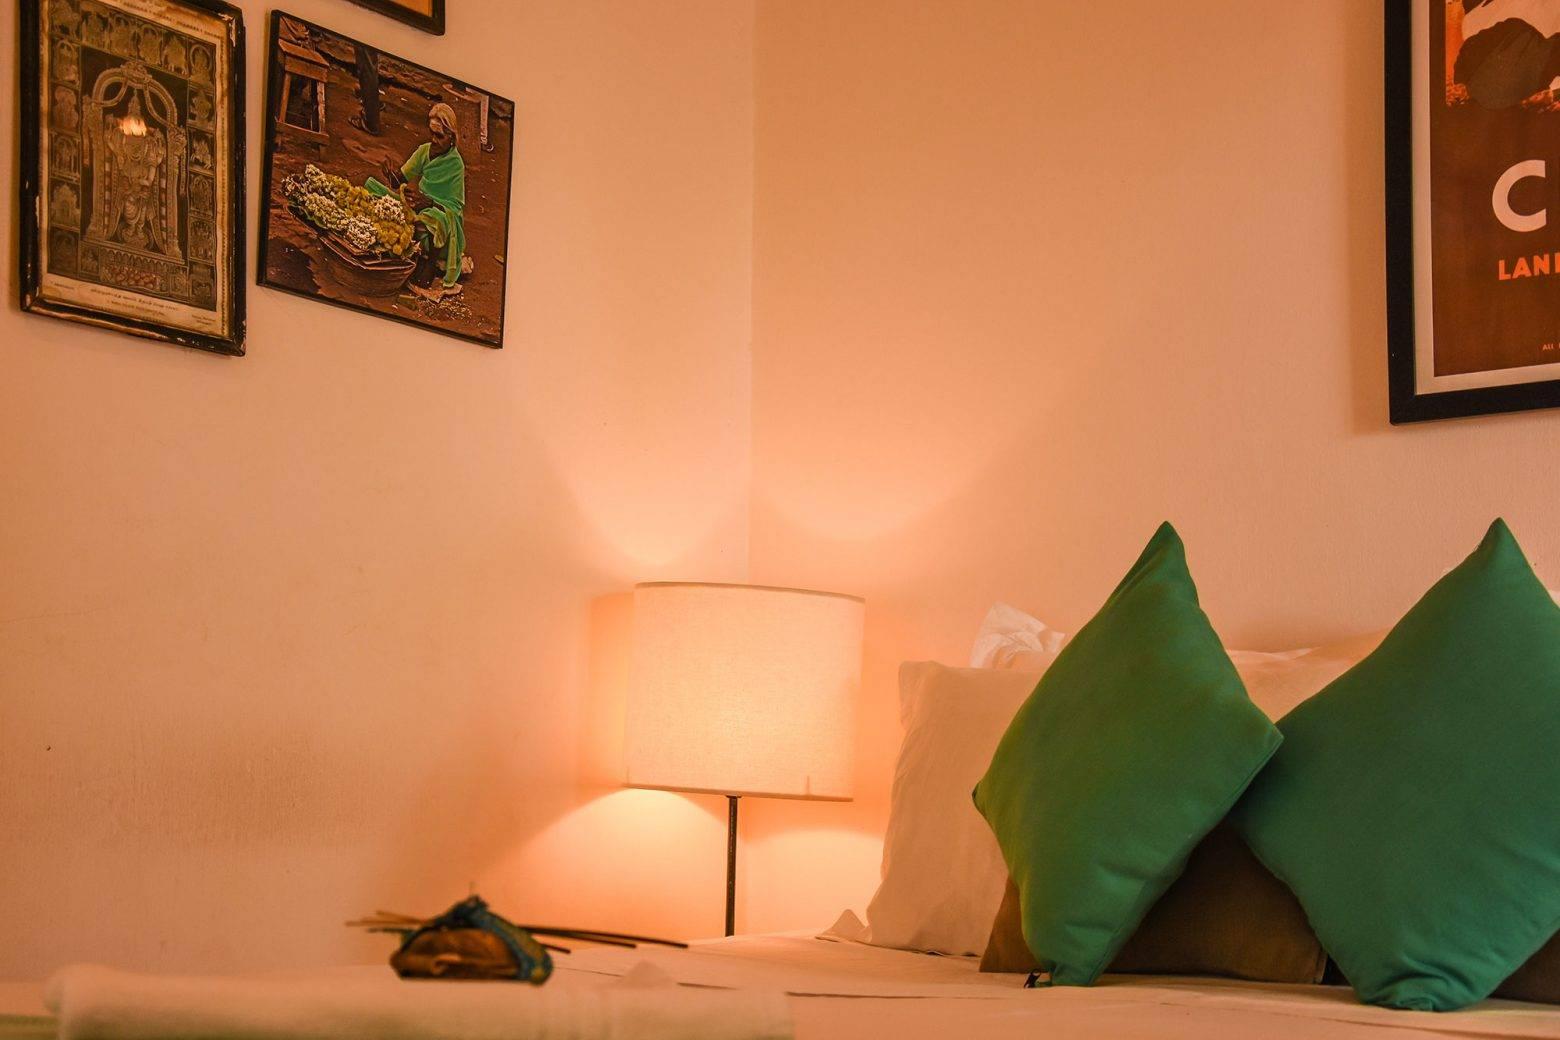 https://www.soulandsurf.com/wp-content/uploads/2021/04/indiarooms@peterchamberlainphoto-_-@tarashirls_Rooms_6-e1627561944162.jpg Image